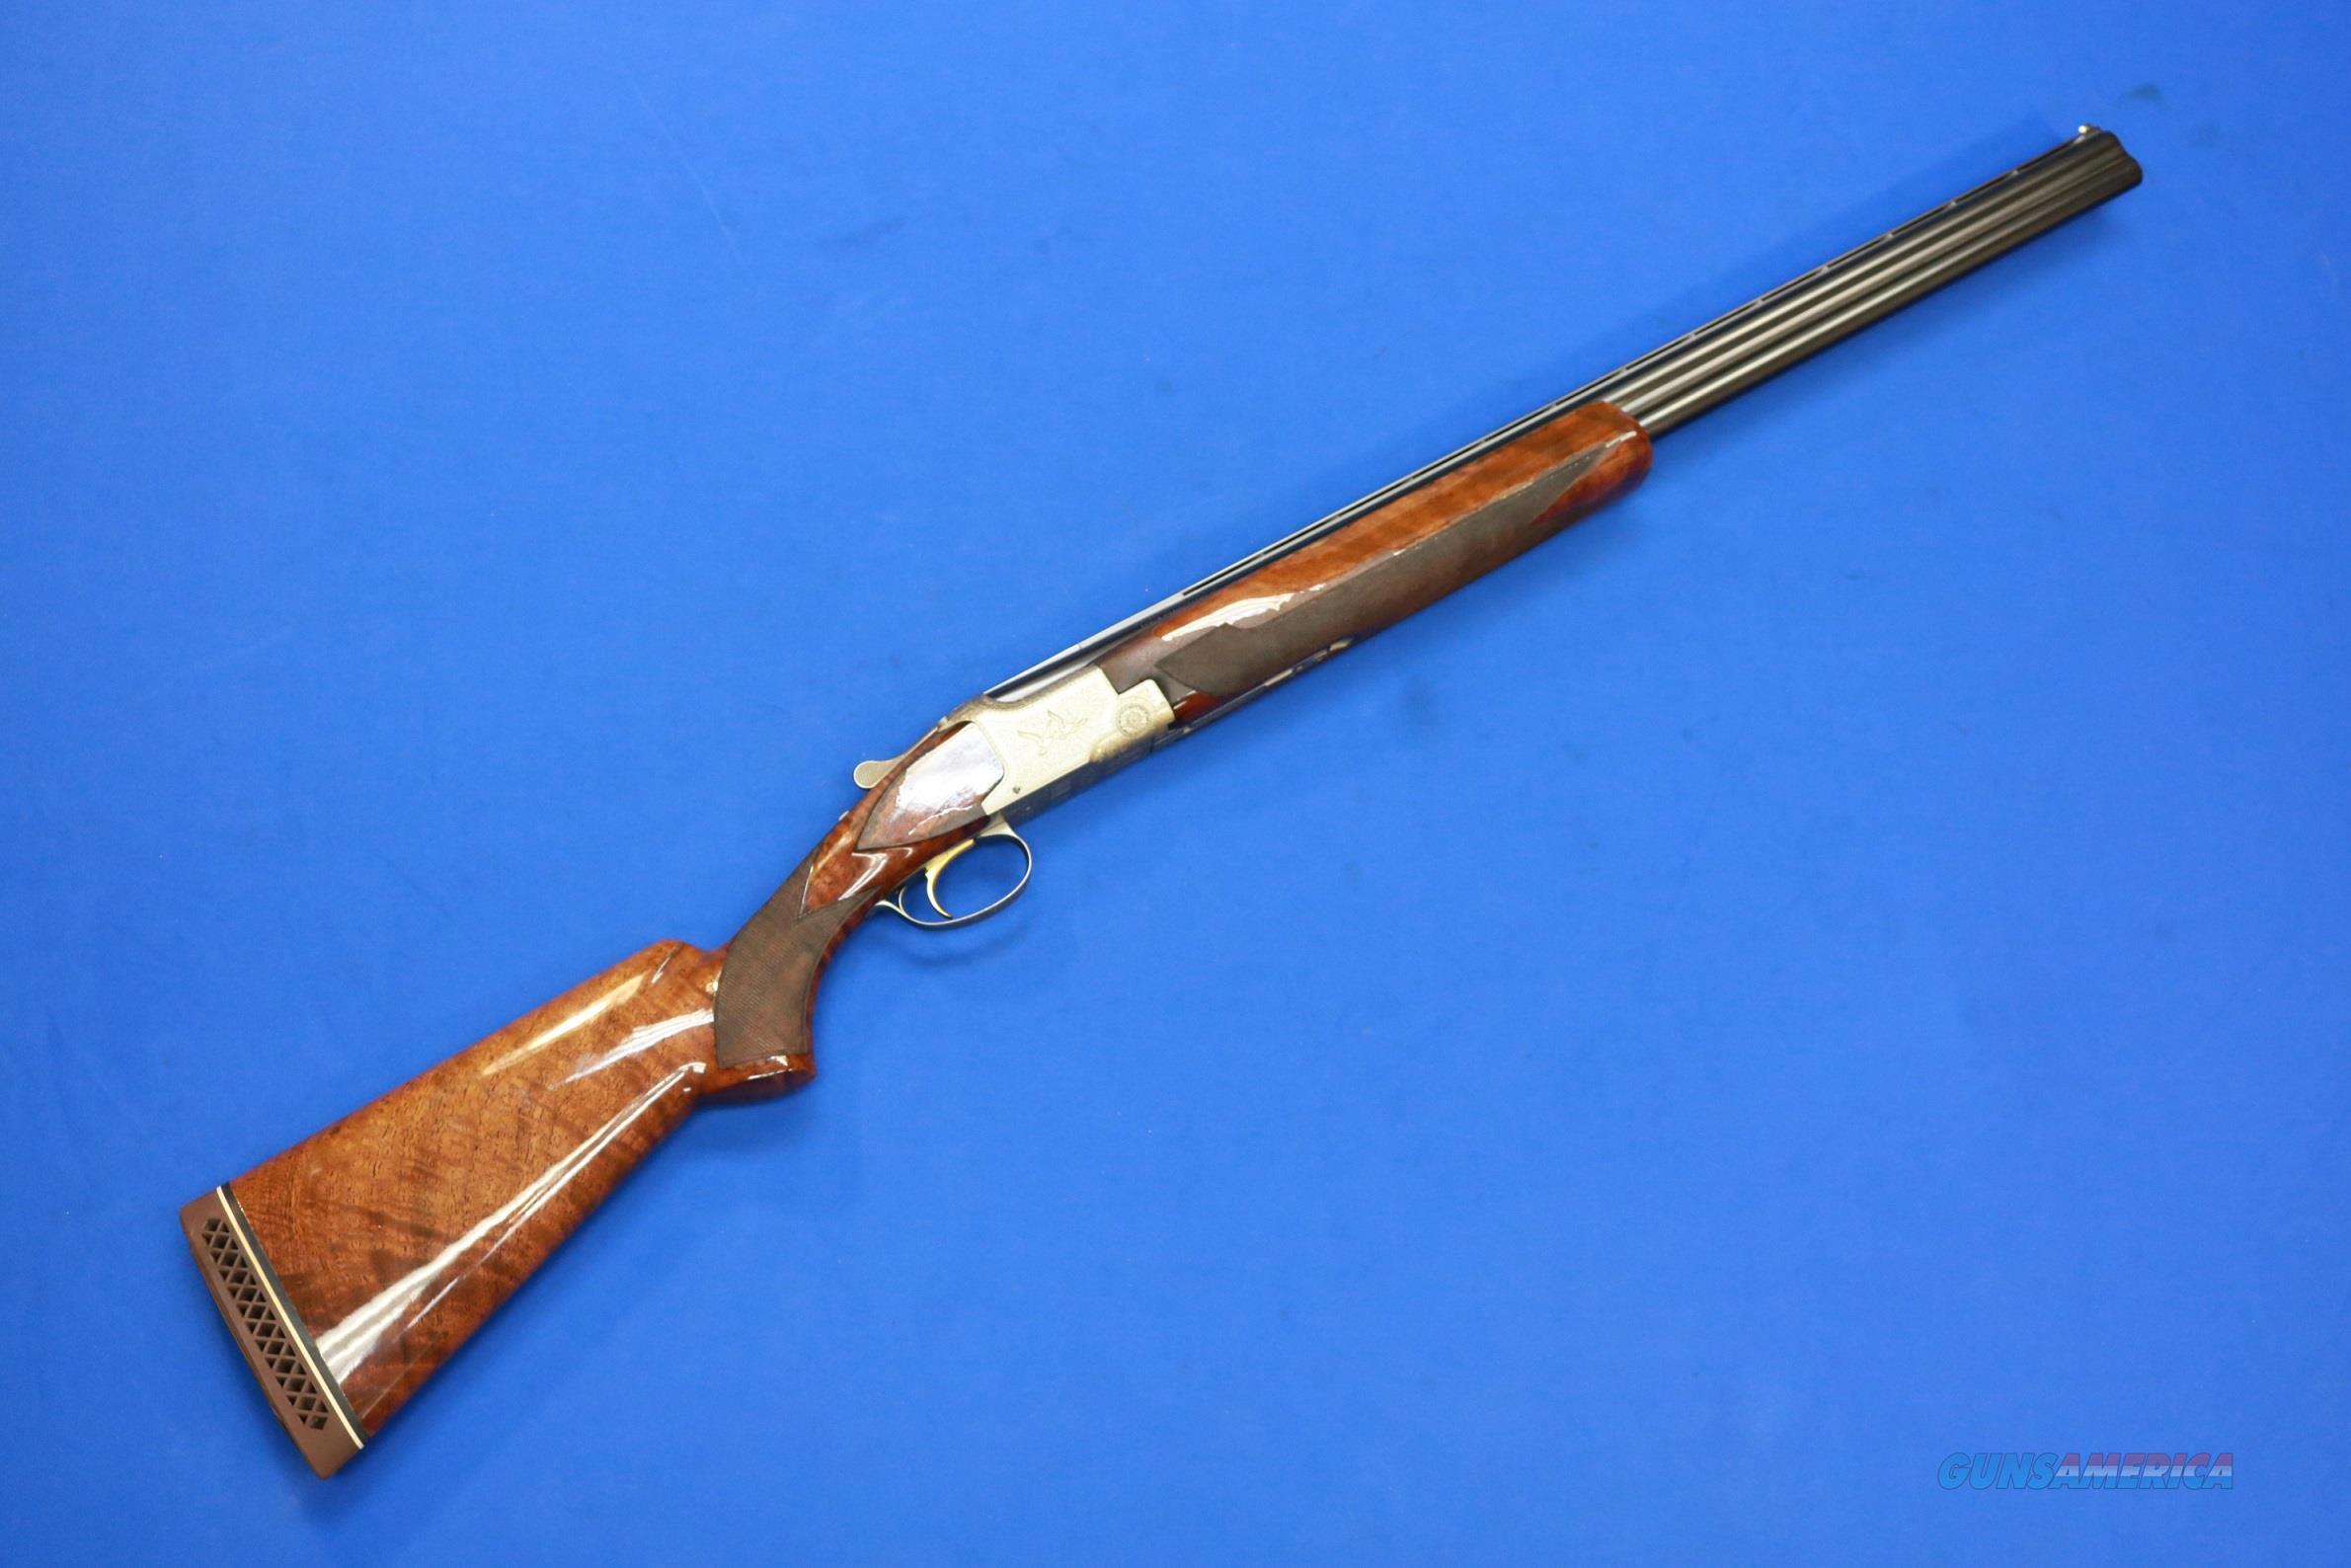 BROWNING SUPERPOSED PIGEON GRADE 20 GAUGE 1970  Guns > Shotguns > Browning Shotguns > Over Unders > Belgian Manufacture